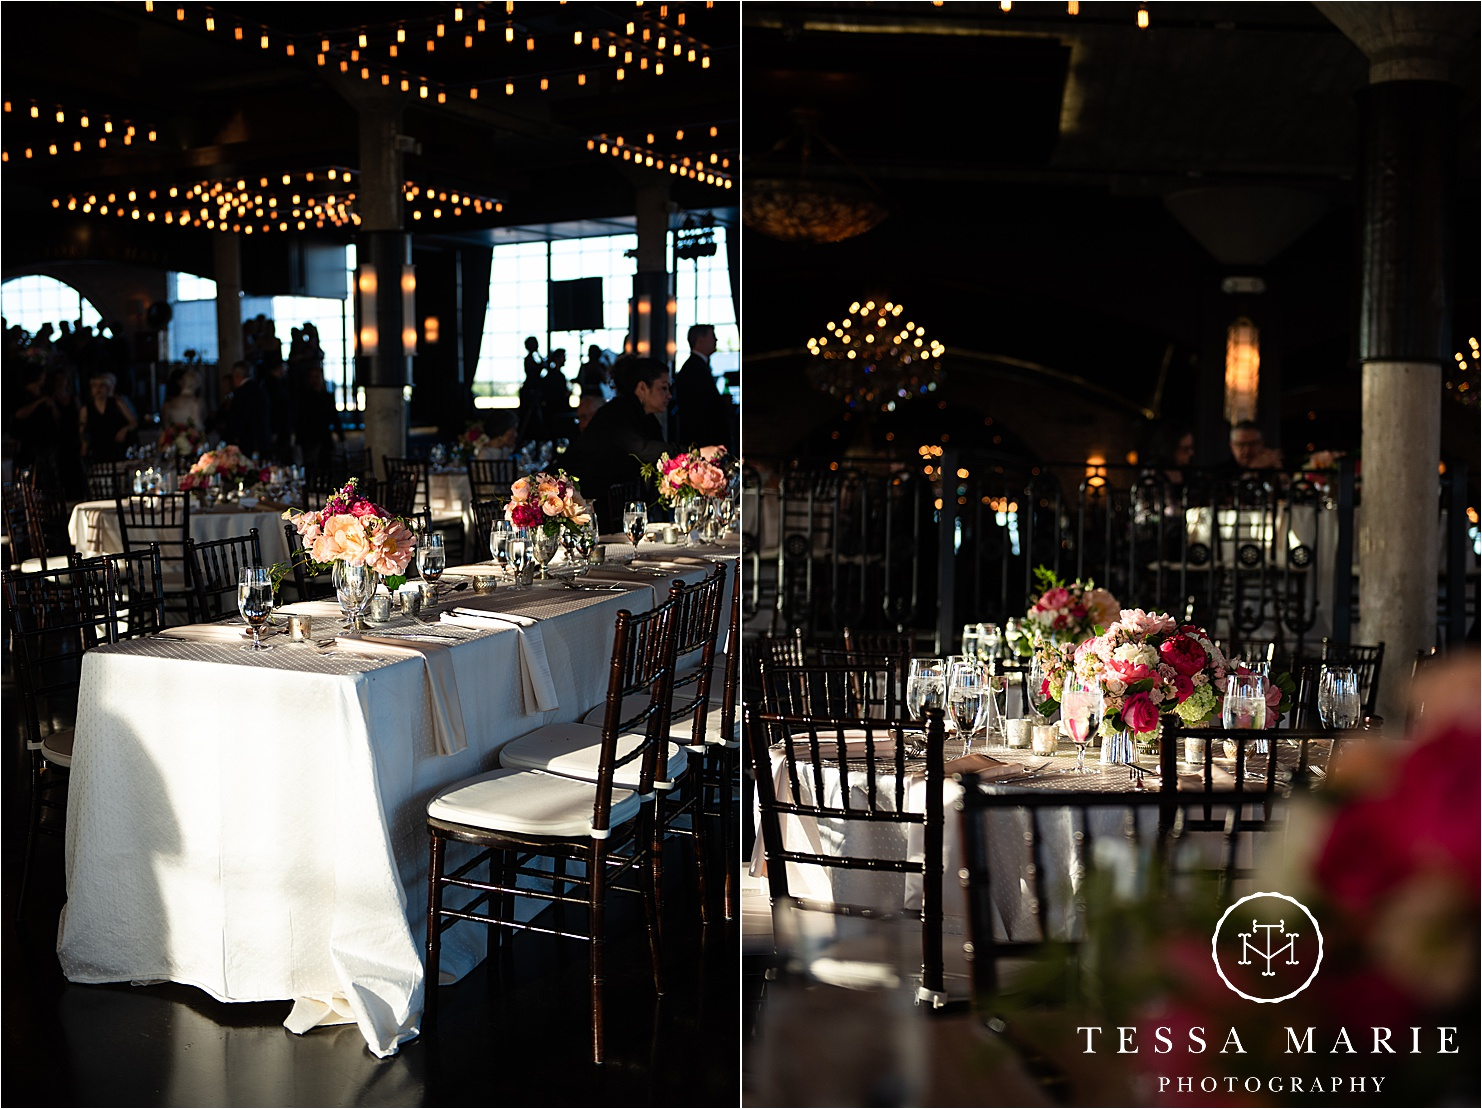 Tessa_marie_weddings_houston_wedding_photographer_The_astorian_0138.jpg